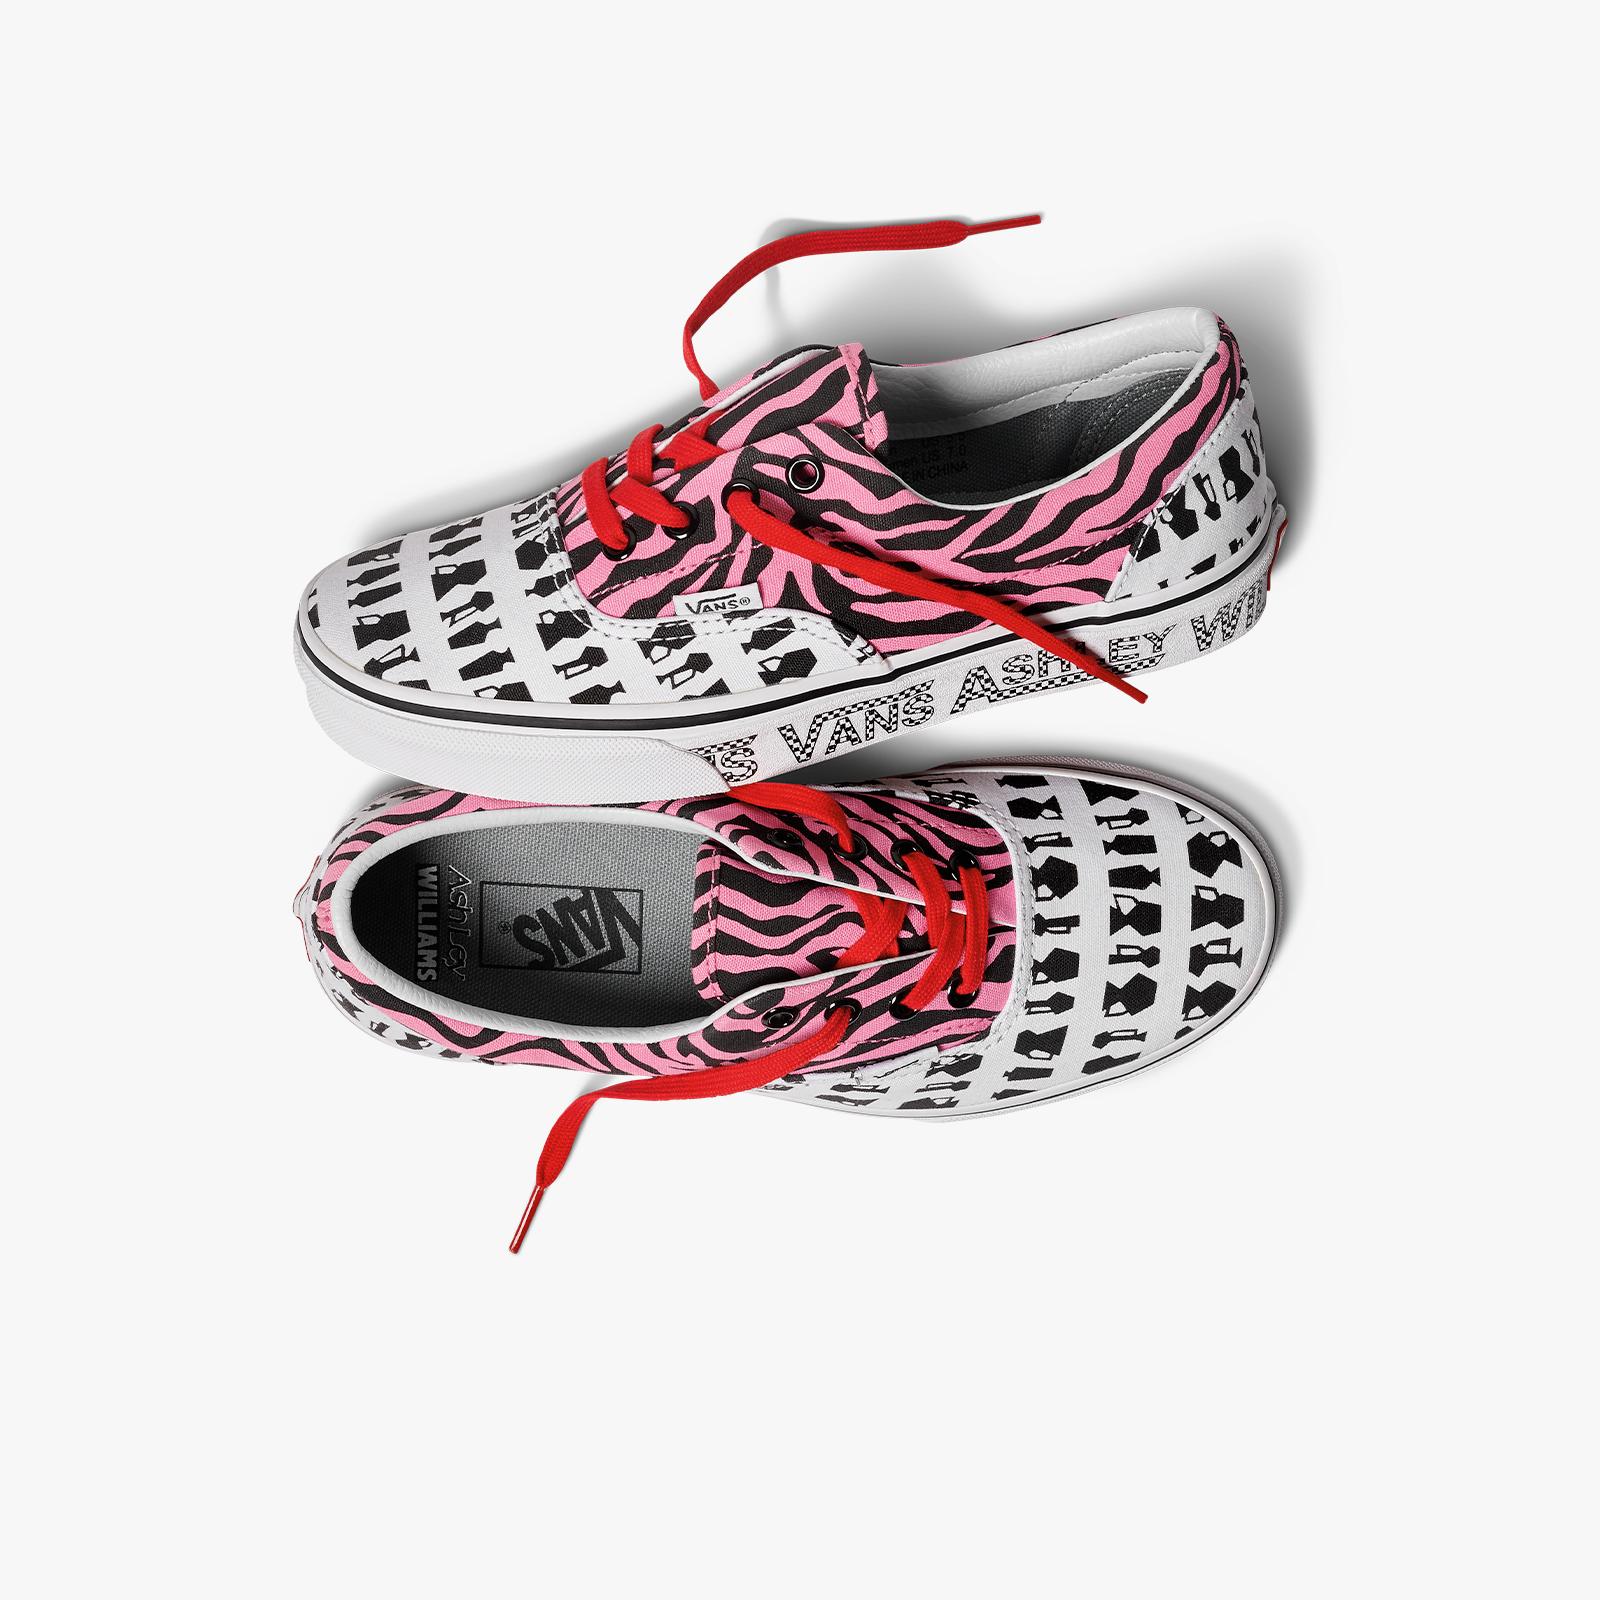 ad595266bbda Vans Era x Ashley Williams - Vn0a38frvol - Sneakersnstuff